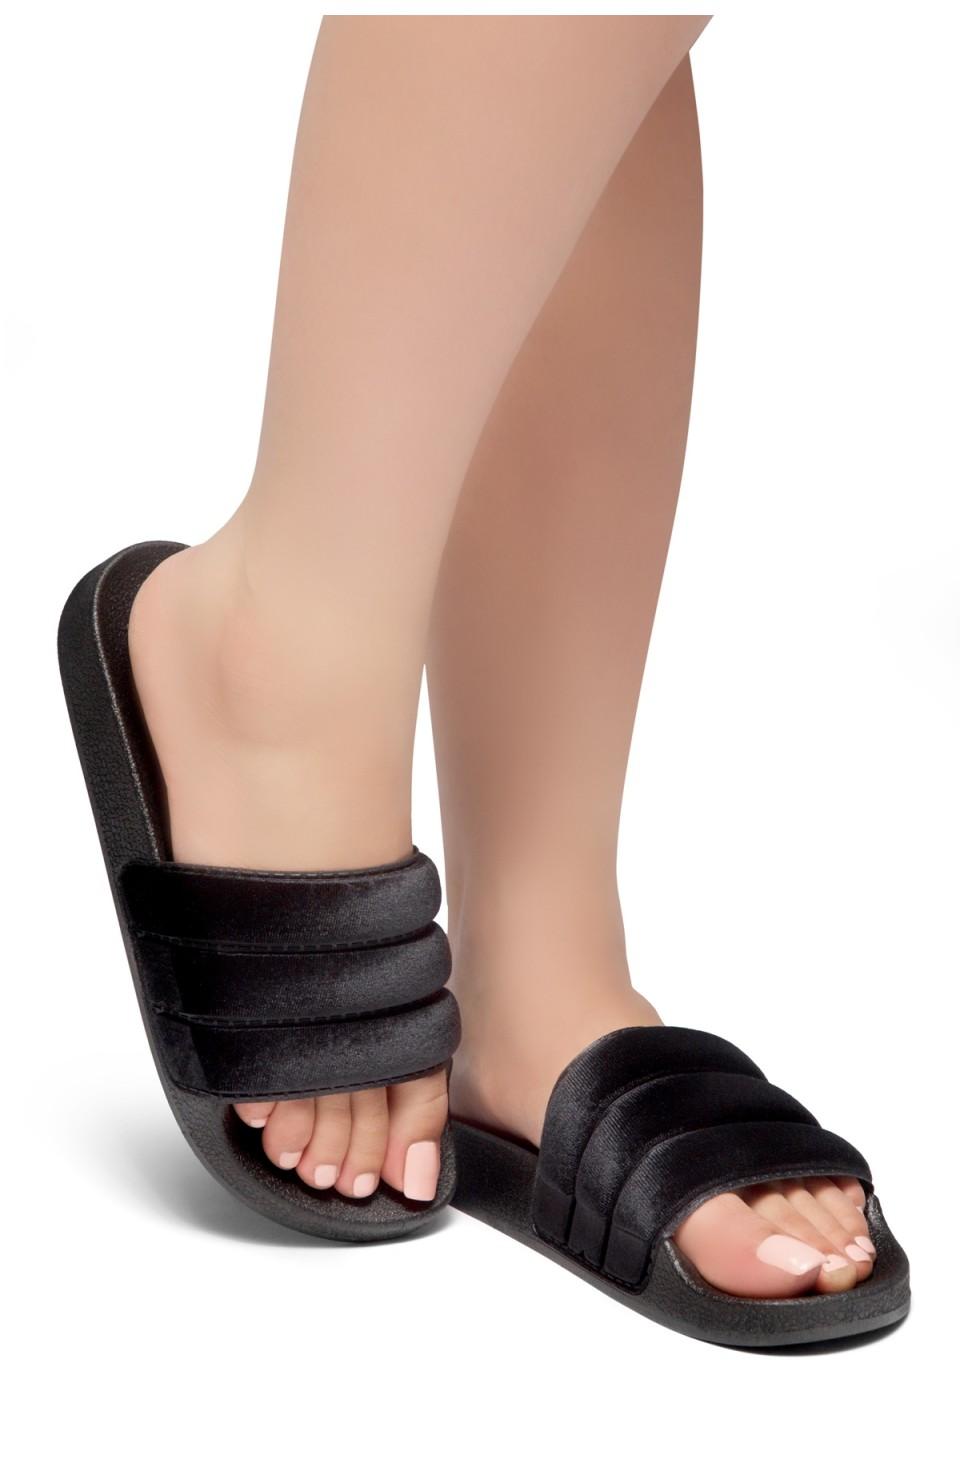 HerStyle SL-170807 Open Toe Slide Sandal (Black)